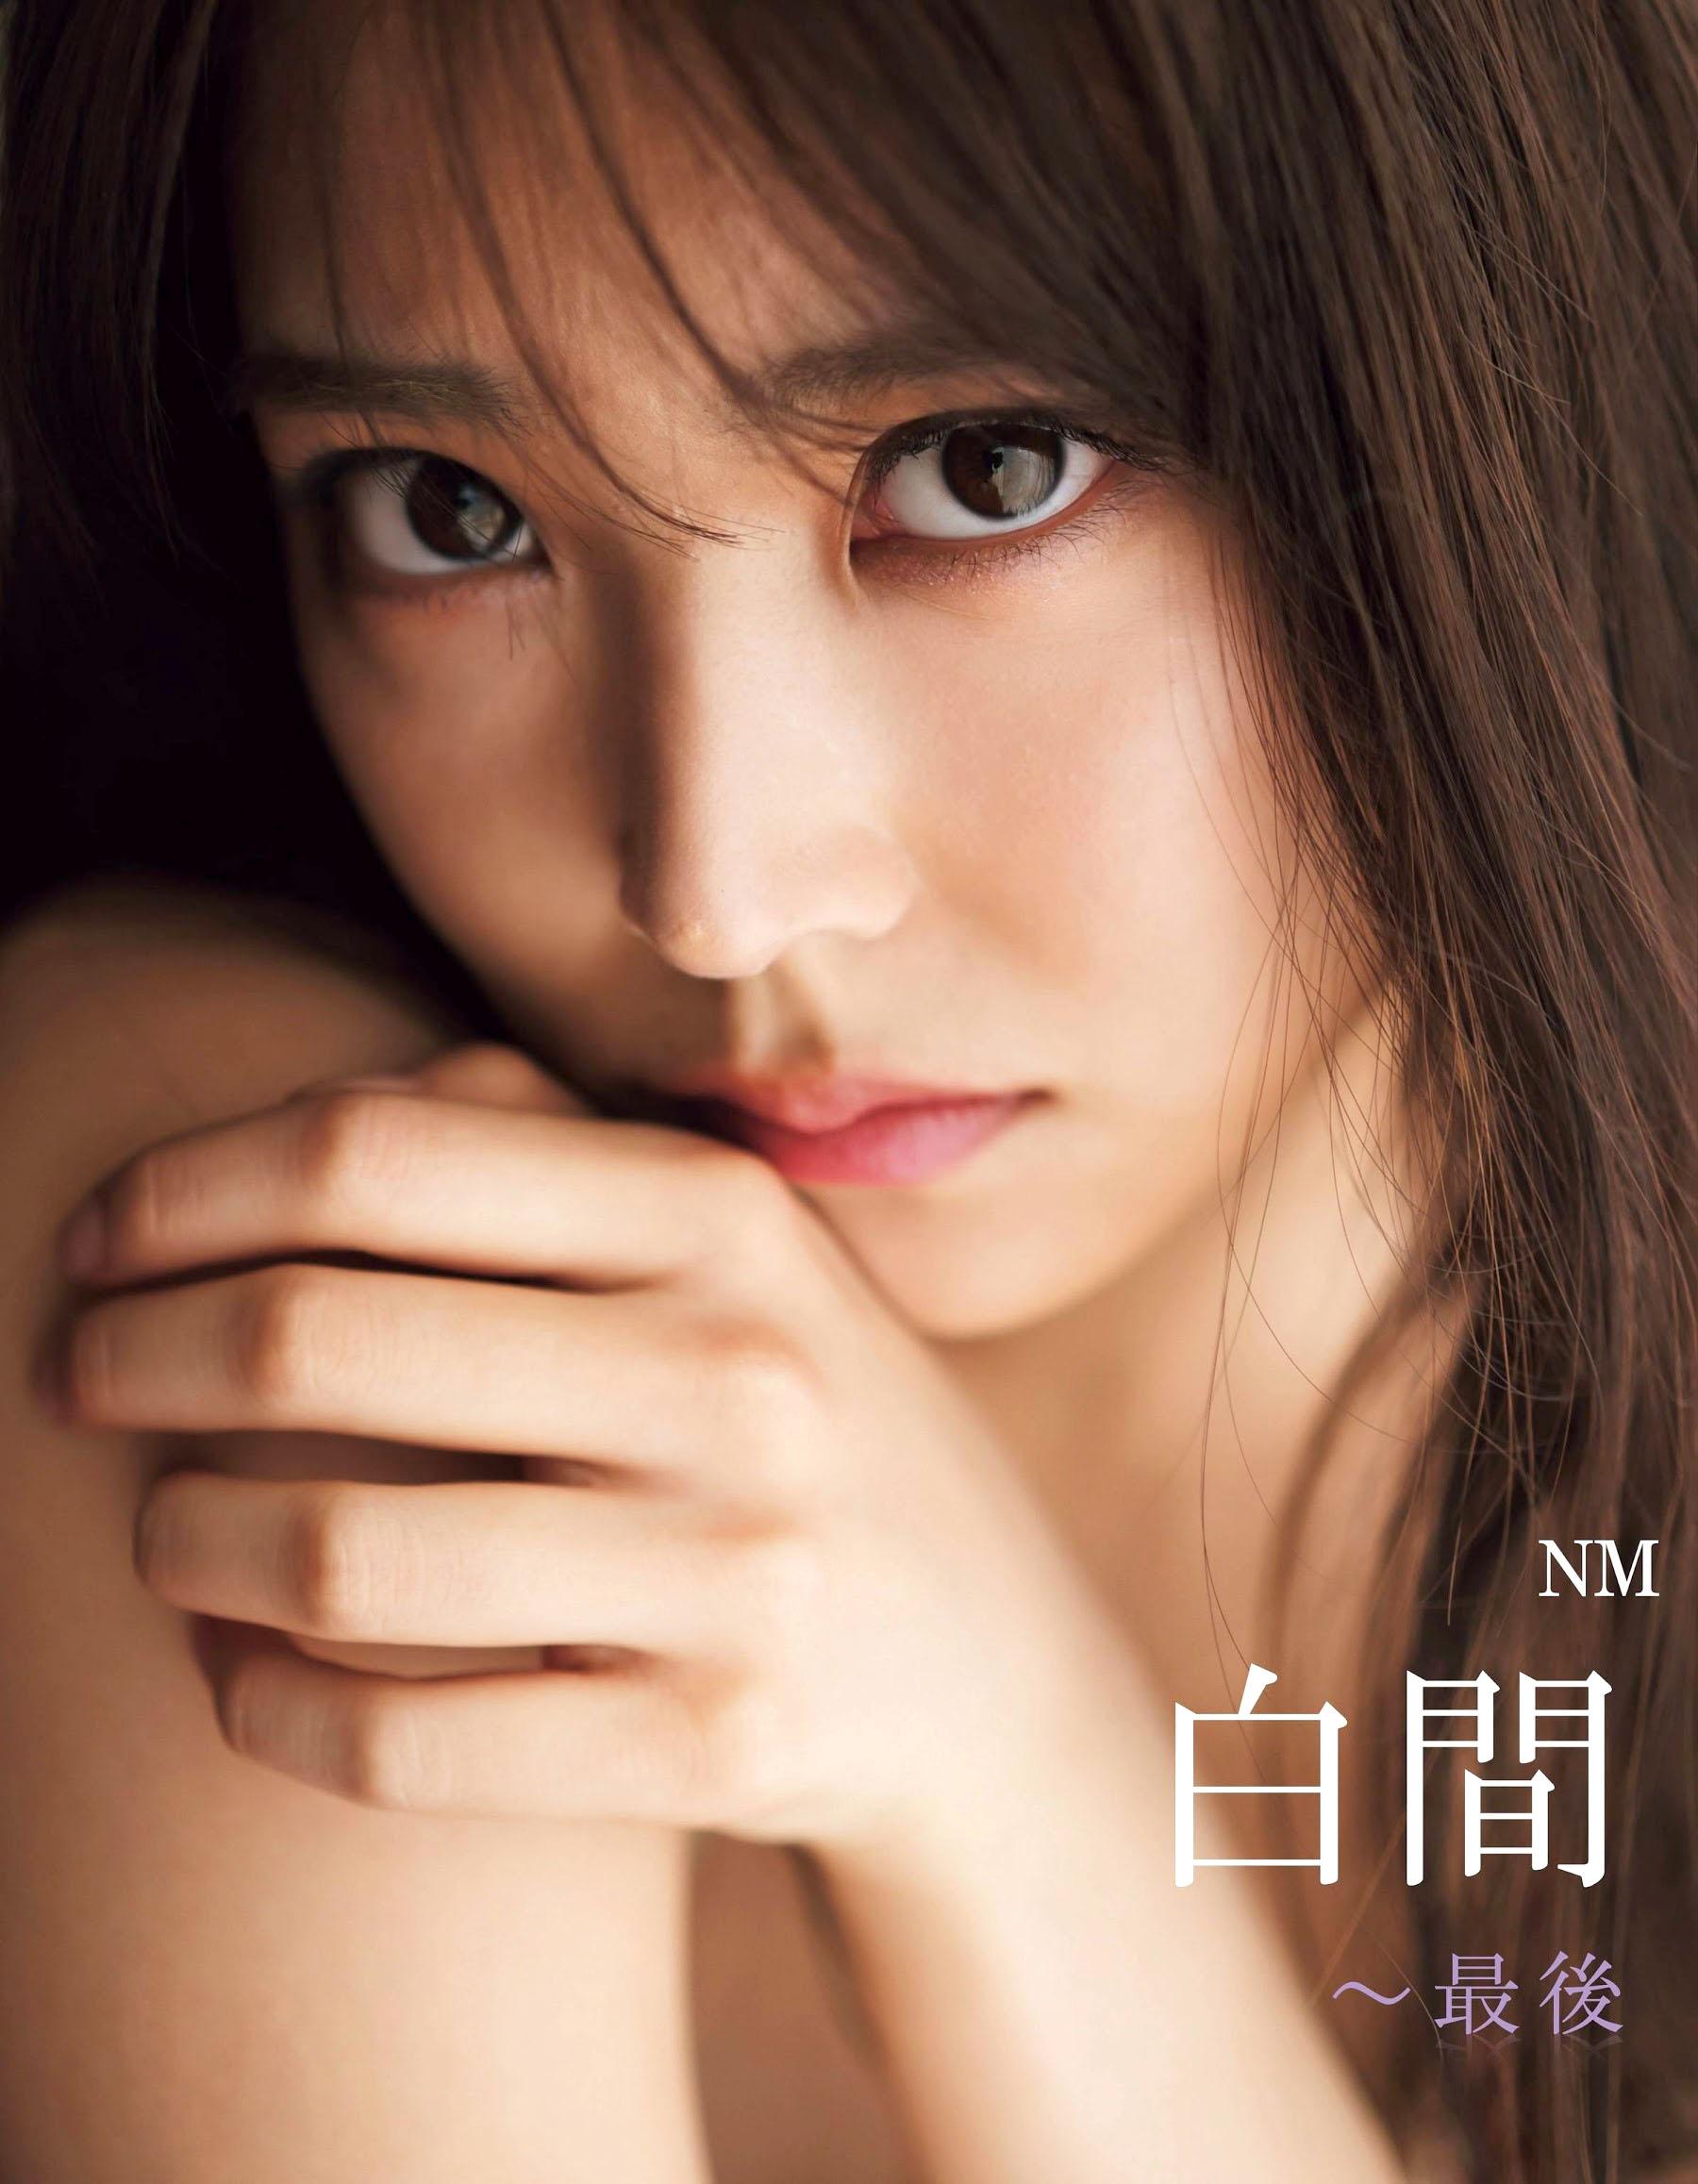 Miru Shiroma EX-Taishu 2106 02.jpg